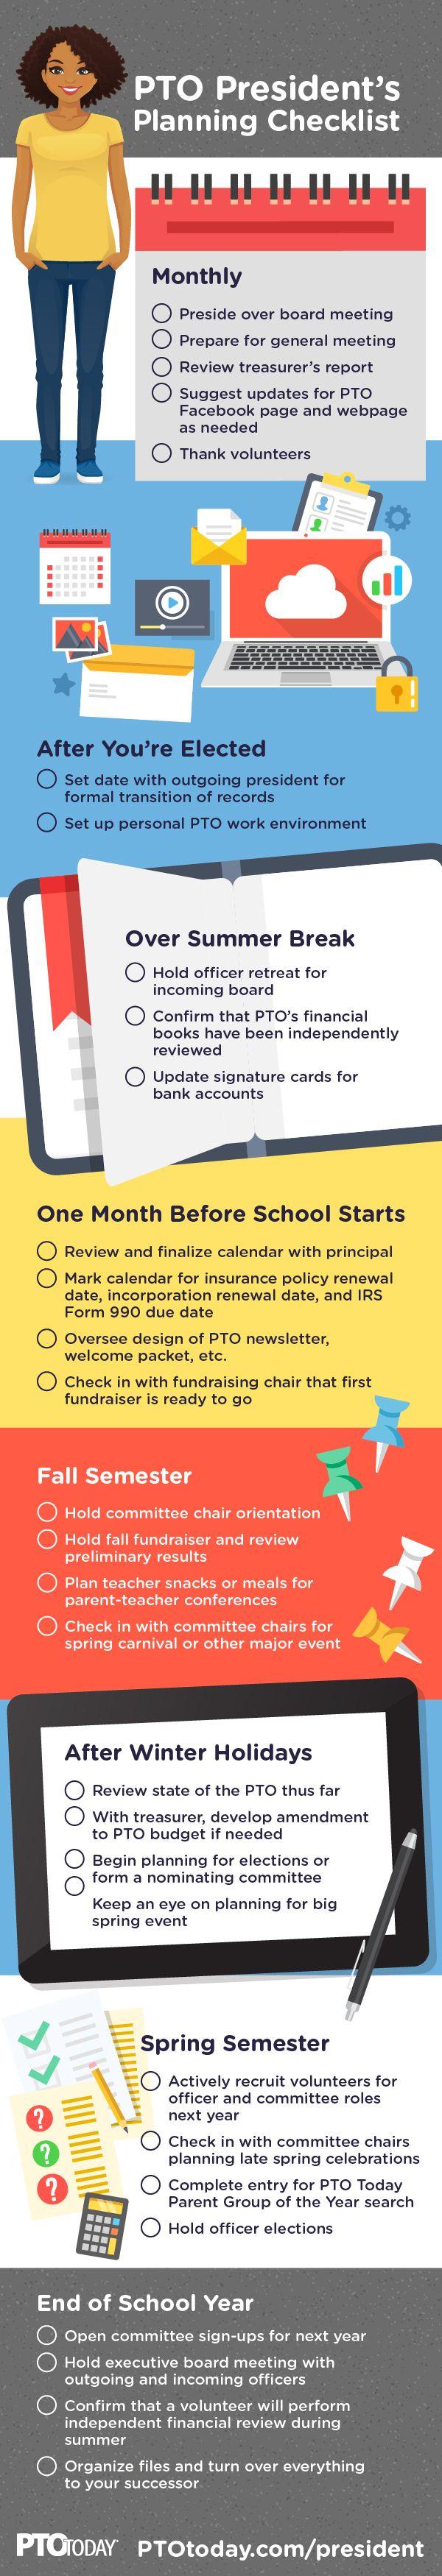 Being a Volunteer PTO Presidentu0027s Planning Checklist